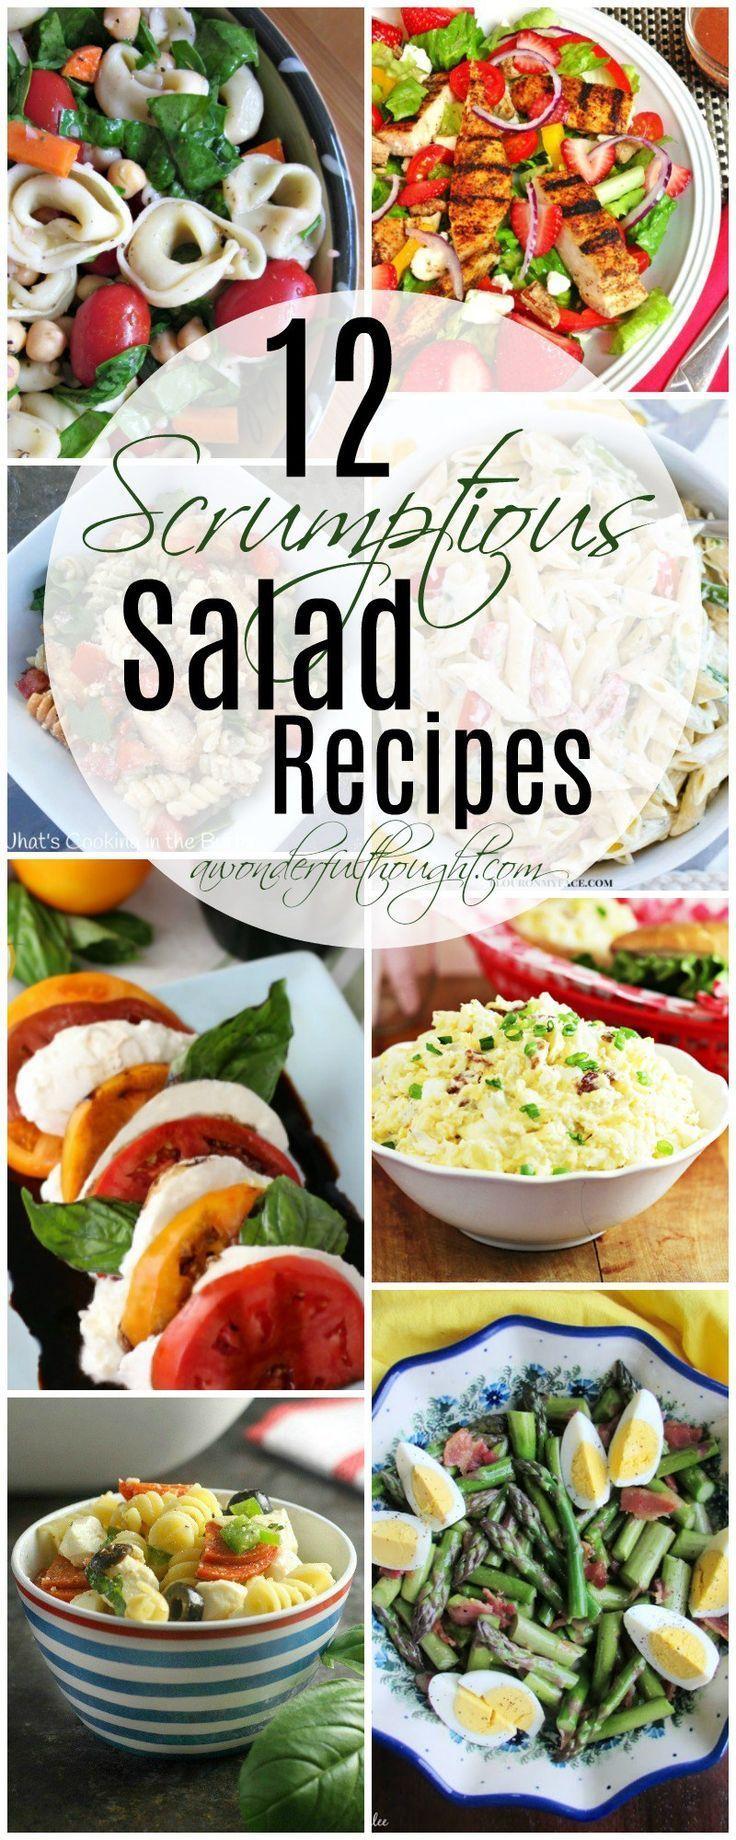 12 Scrumptious Summer Salads